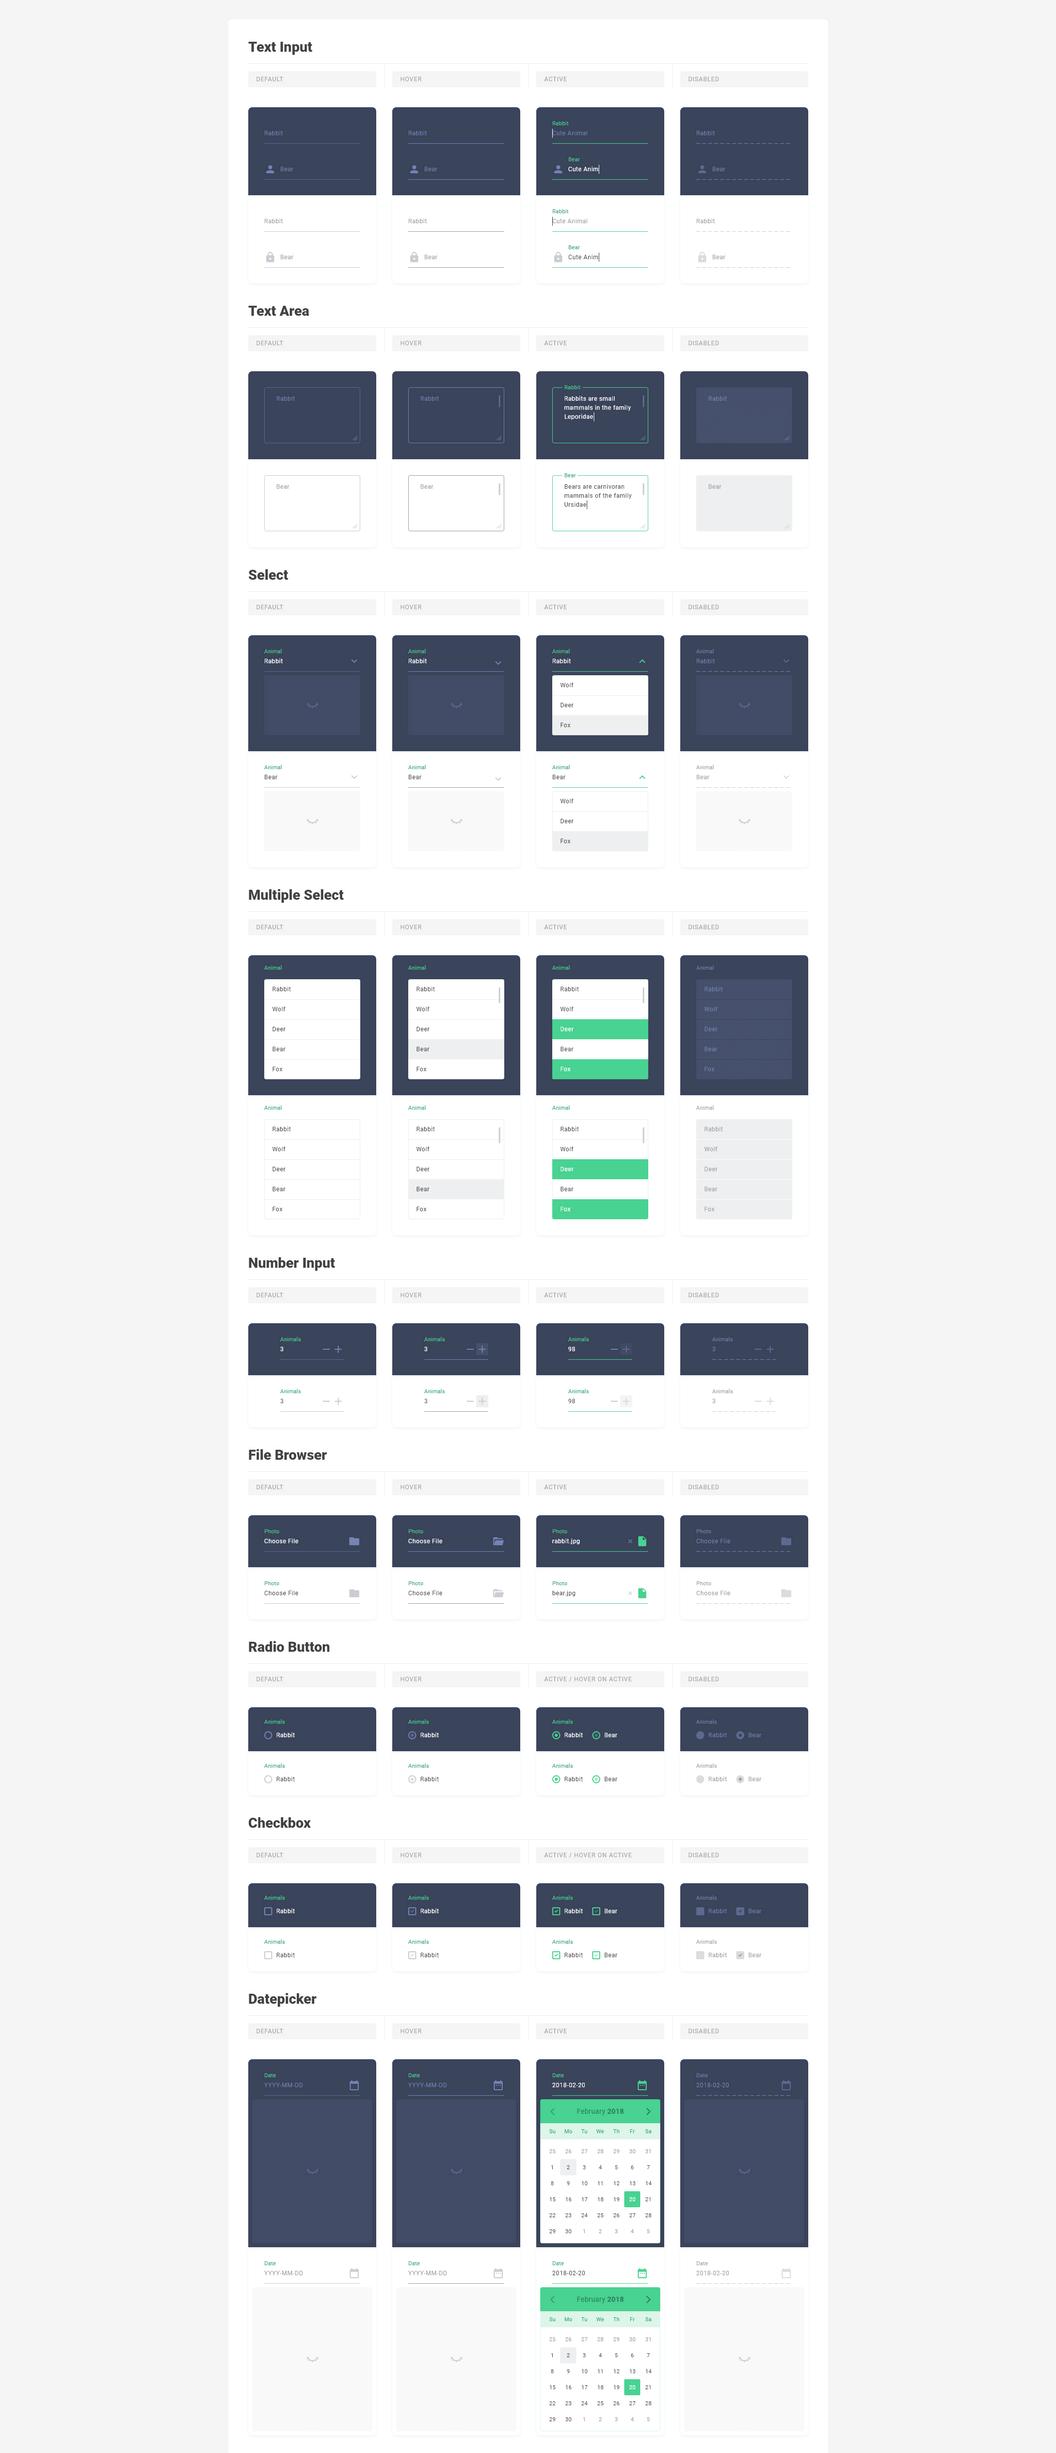 Стайлгайд Forest – Все веб компоненты для Adobe Xd и Sketch